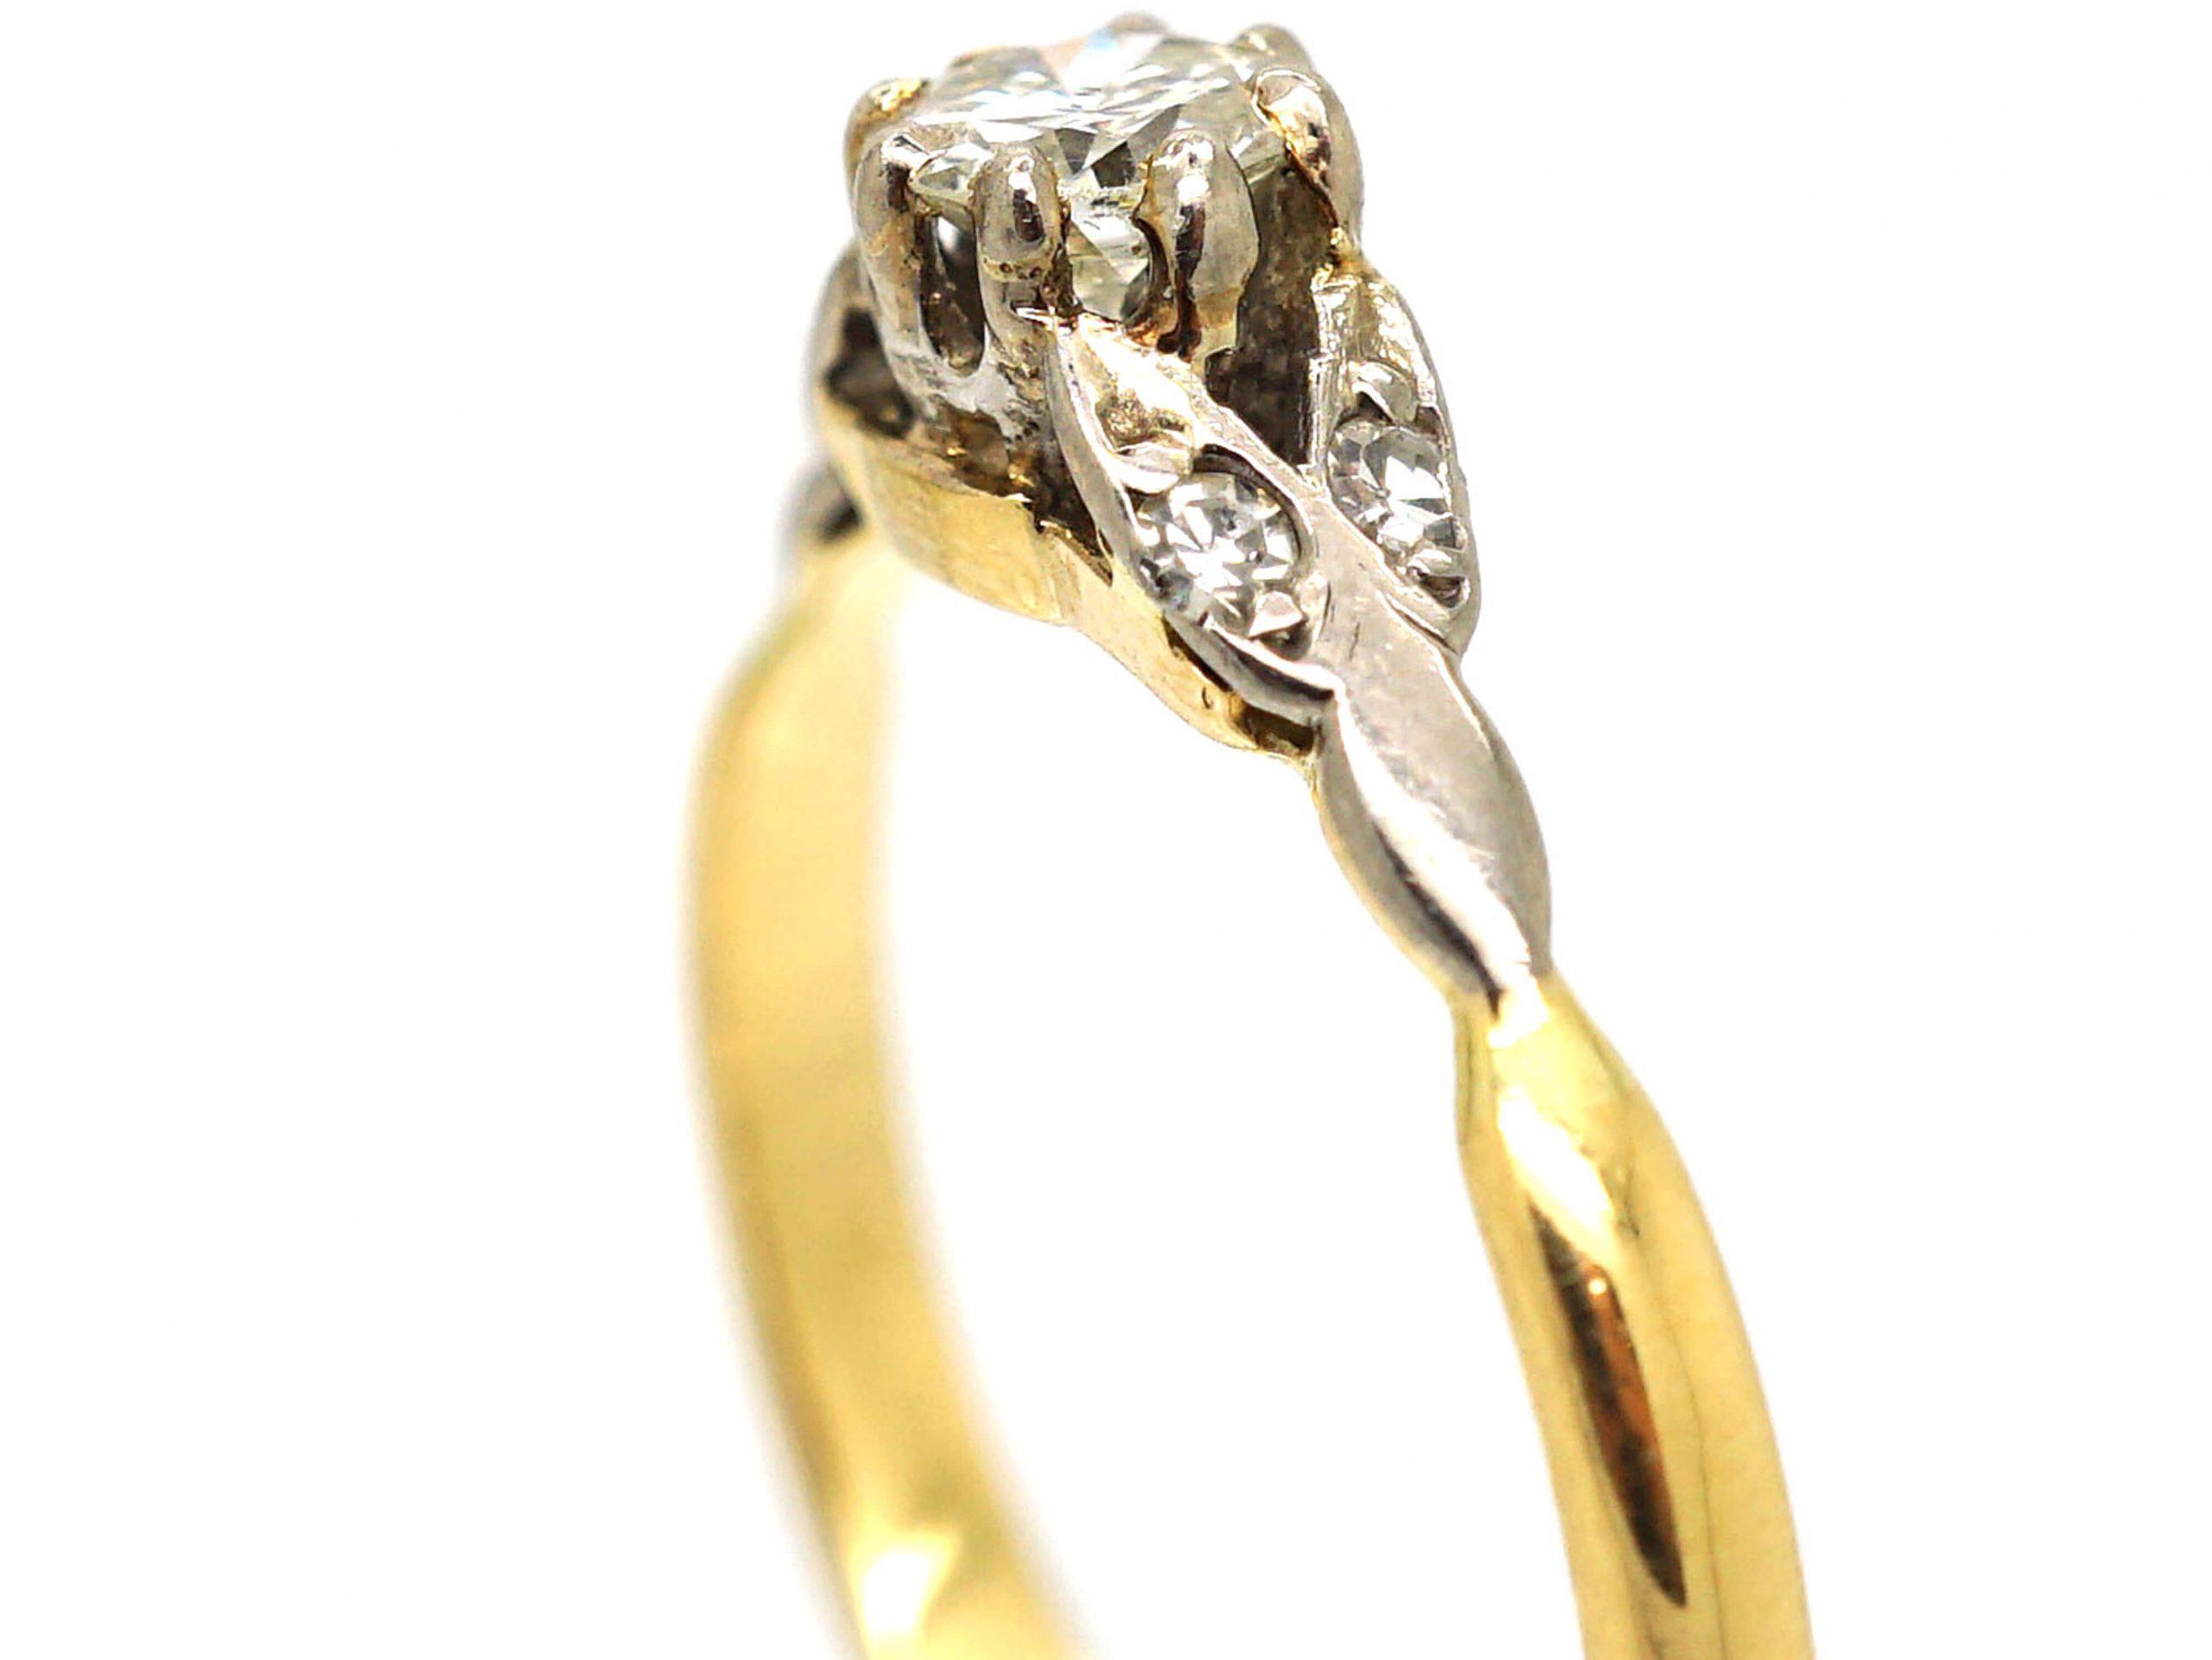 Art Deco Diamond Solitaire Ring with Diamond Set Leaf Shoulders